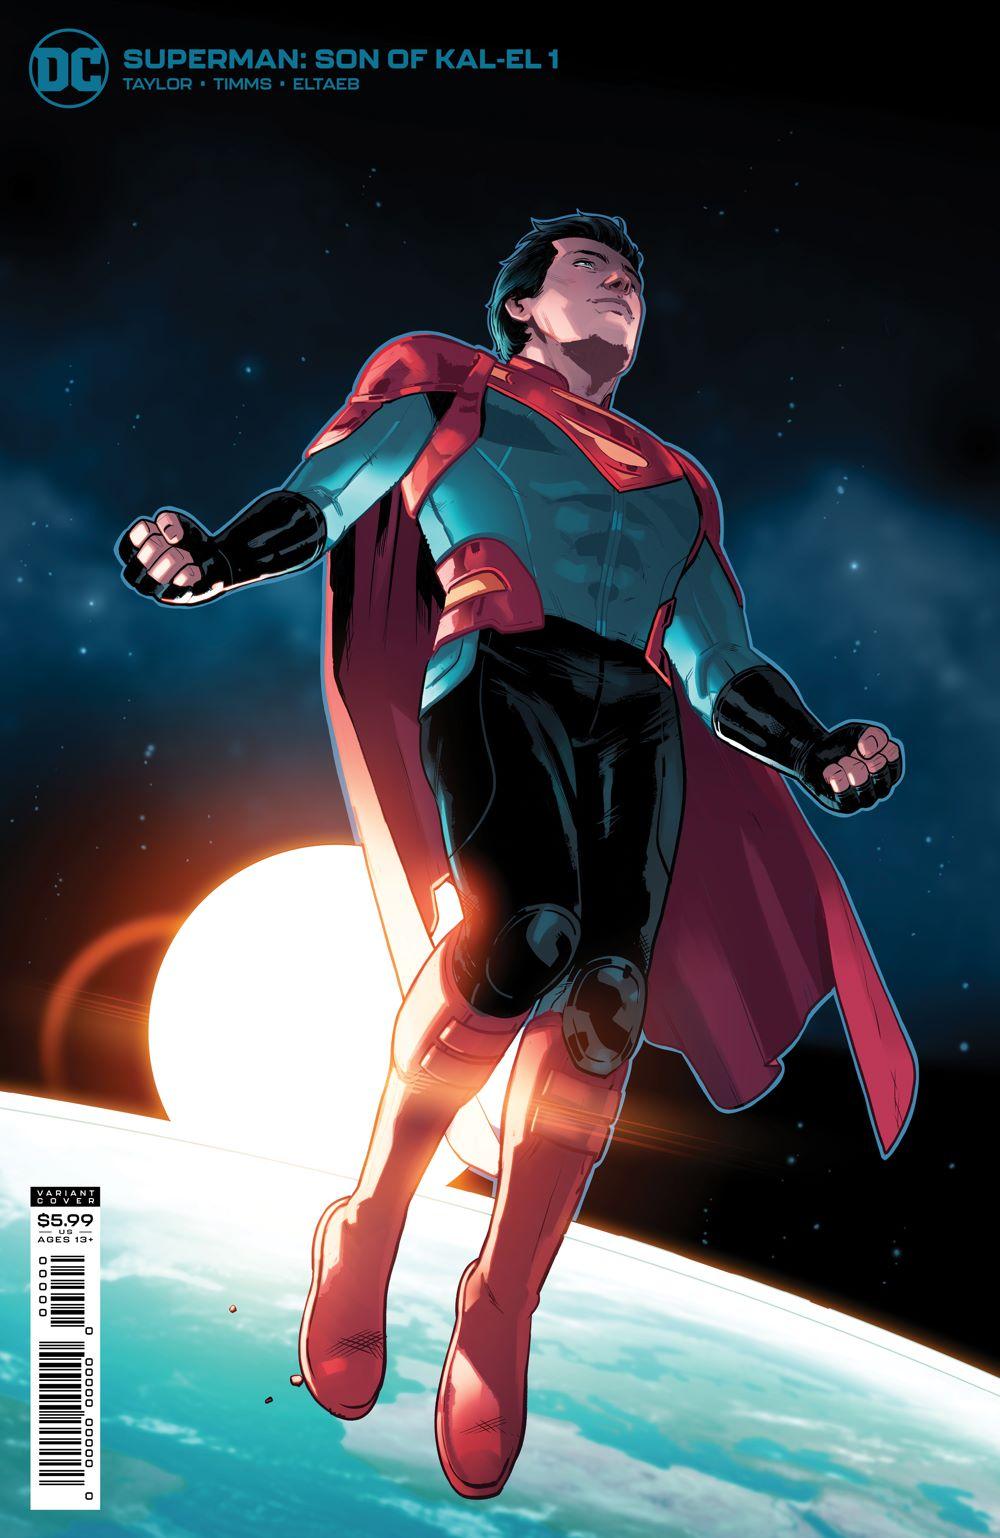 SMSOKE_Cv1_var2 DC Comics July 2021 Solicitations